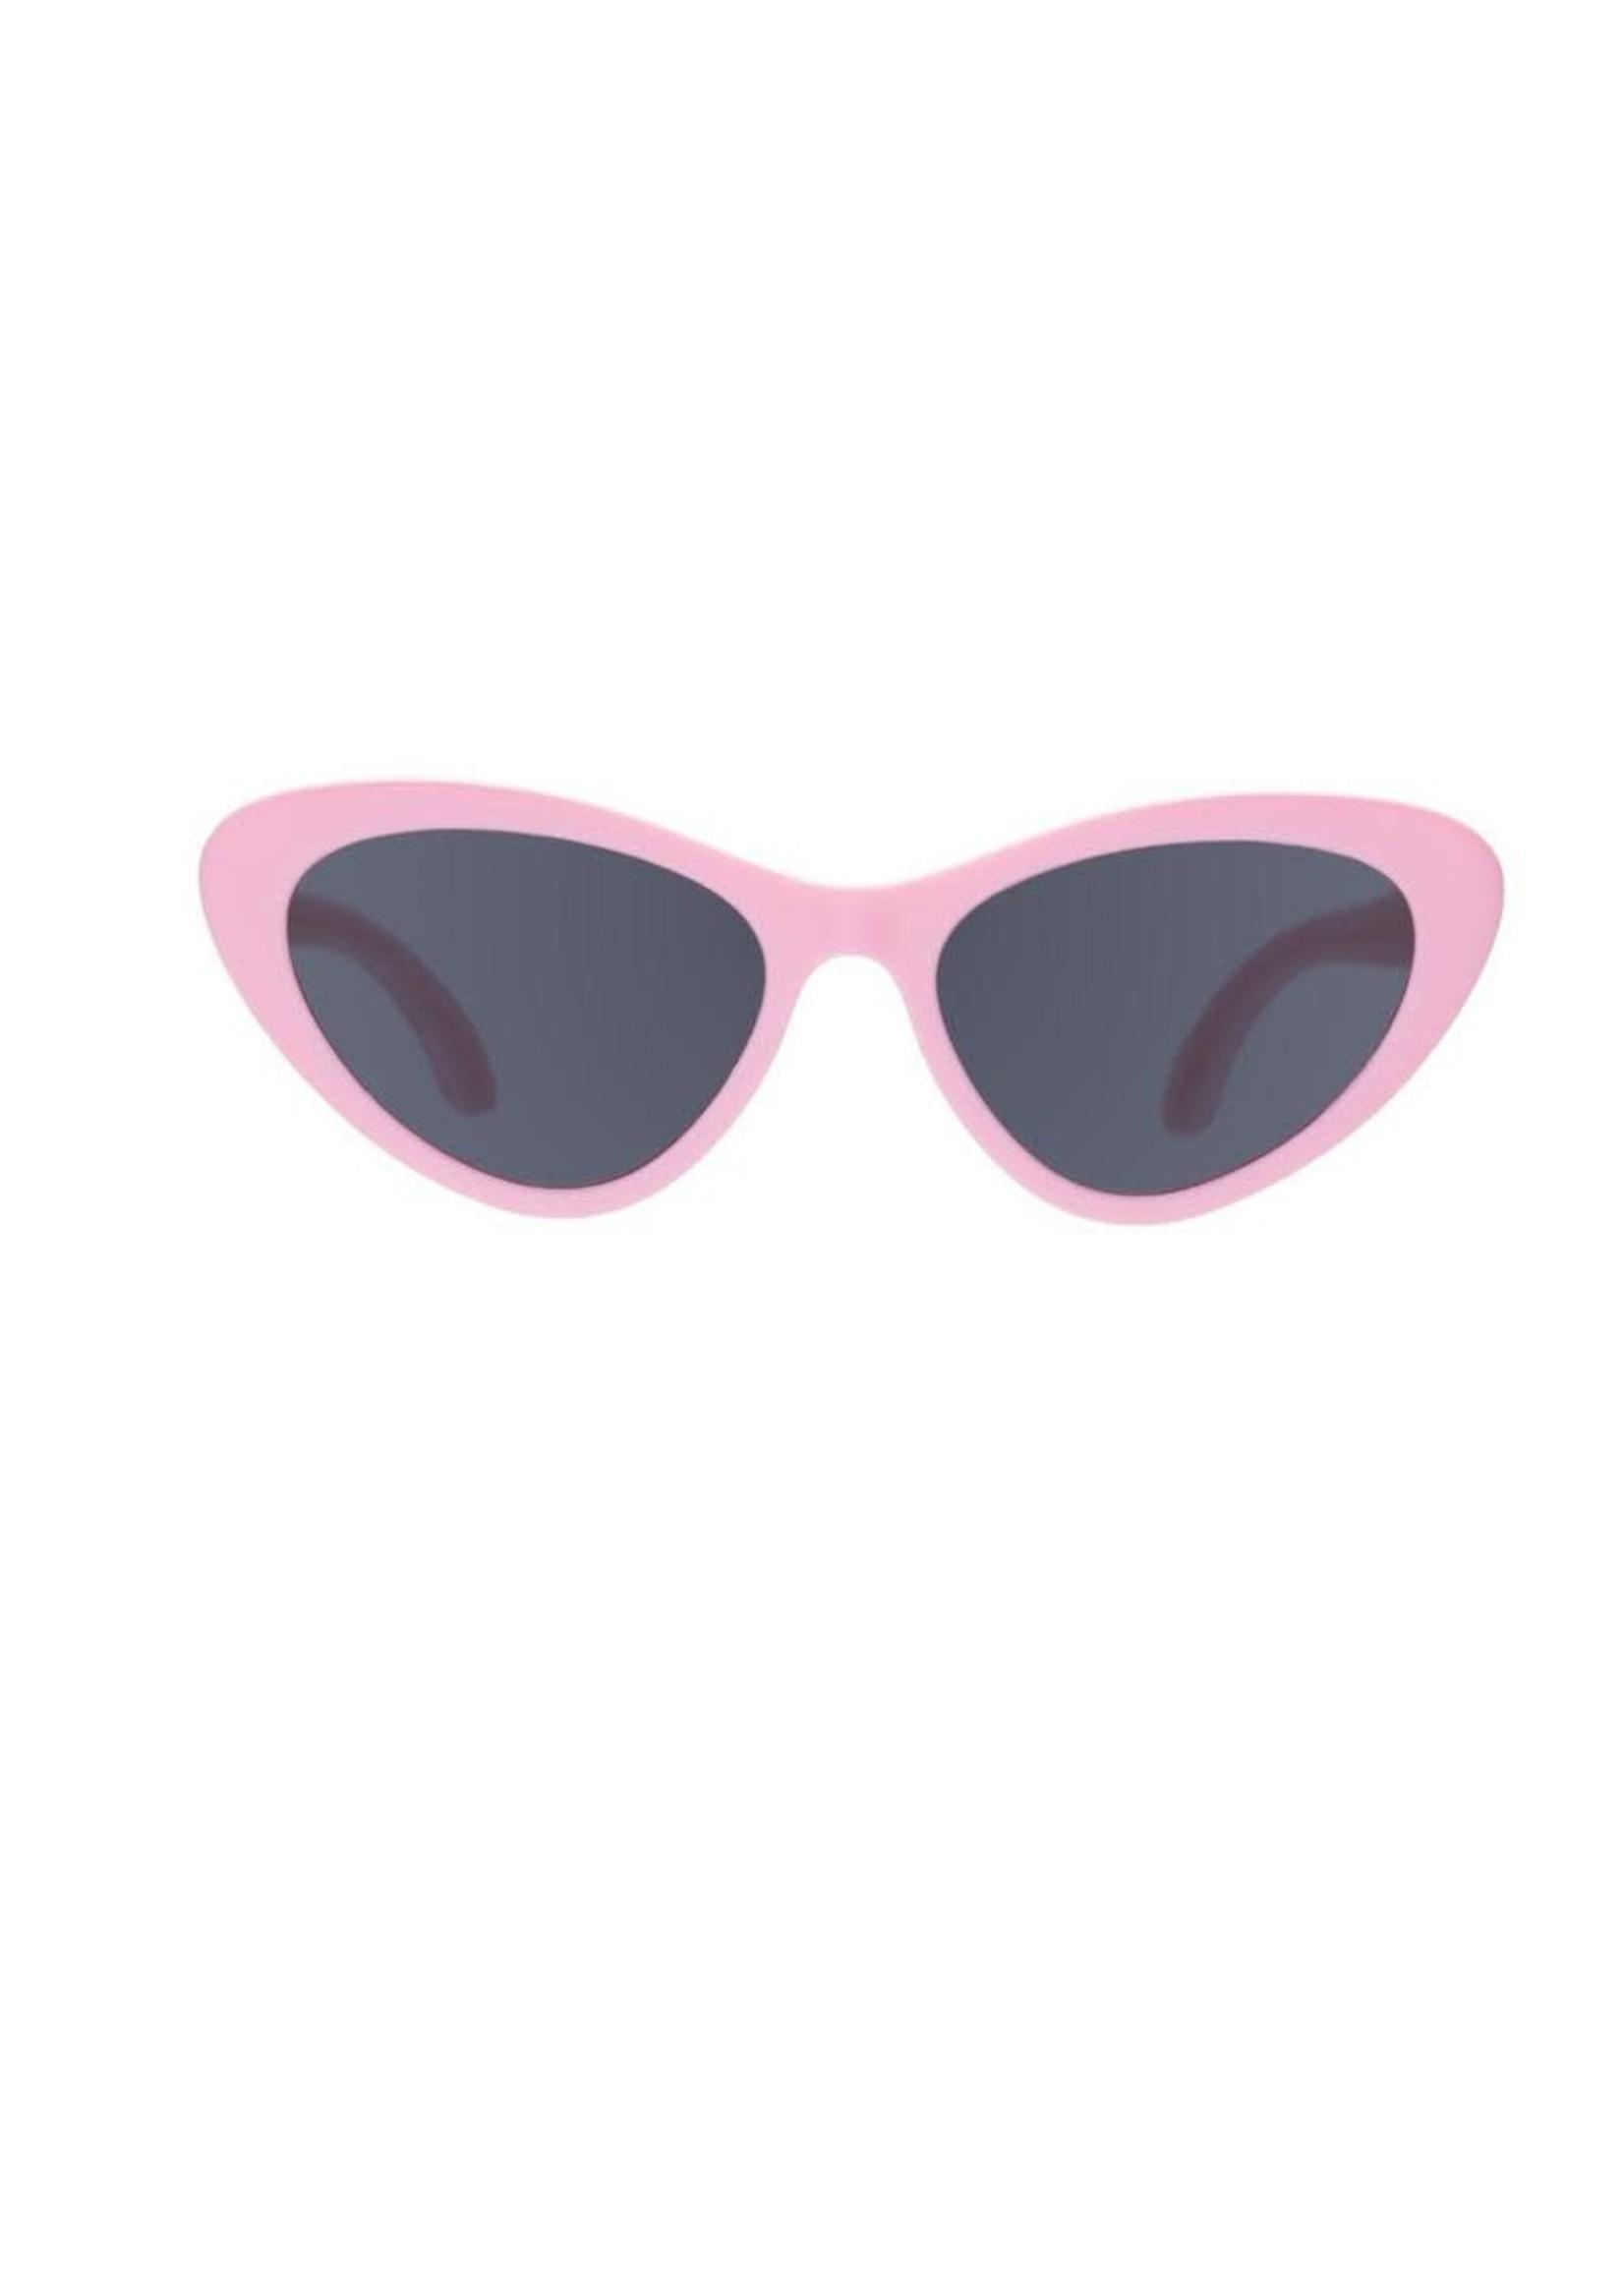 Babiators Babiators, Original Cat-Eye Sunglasses Pink Lady